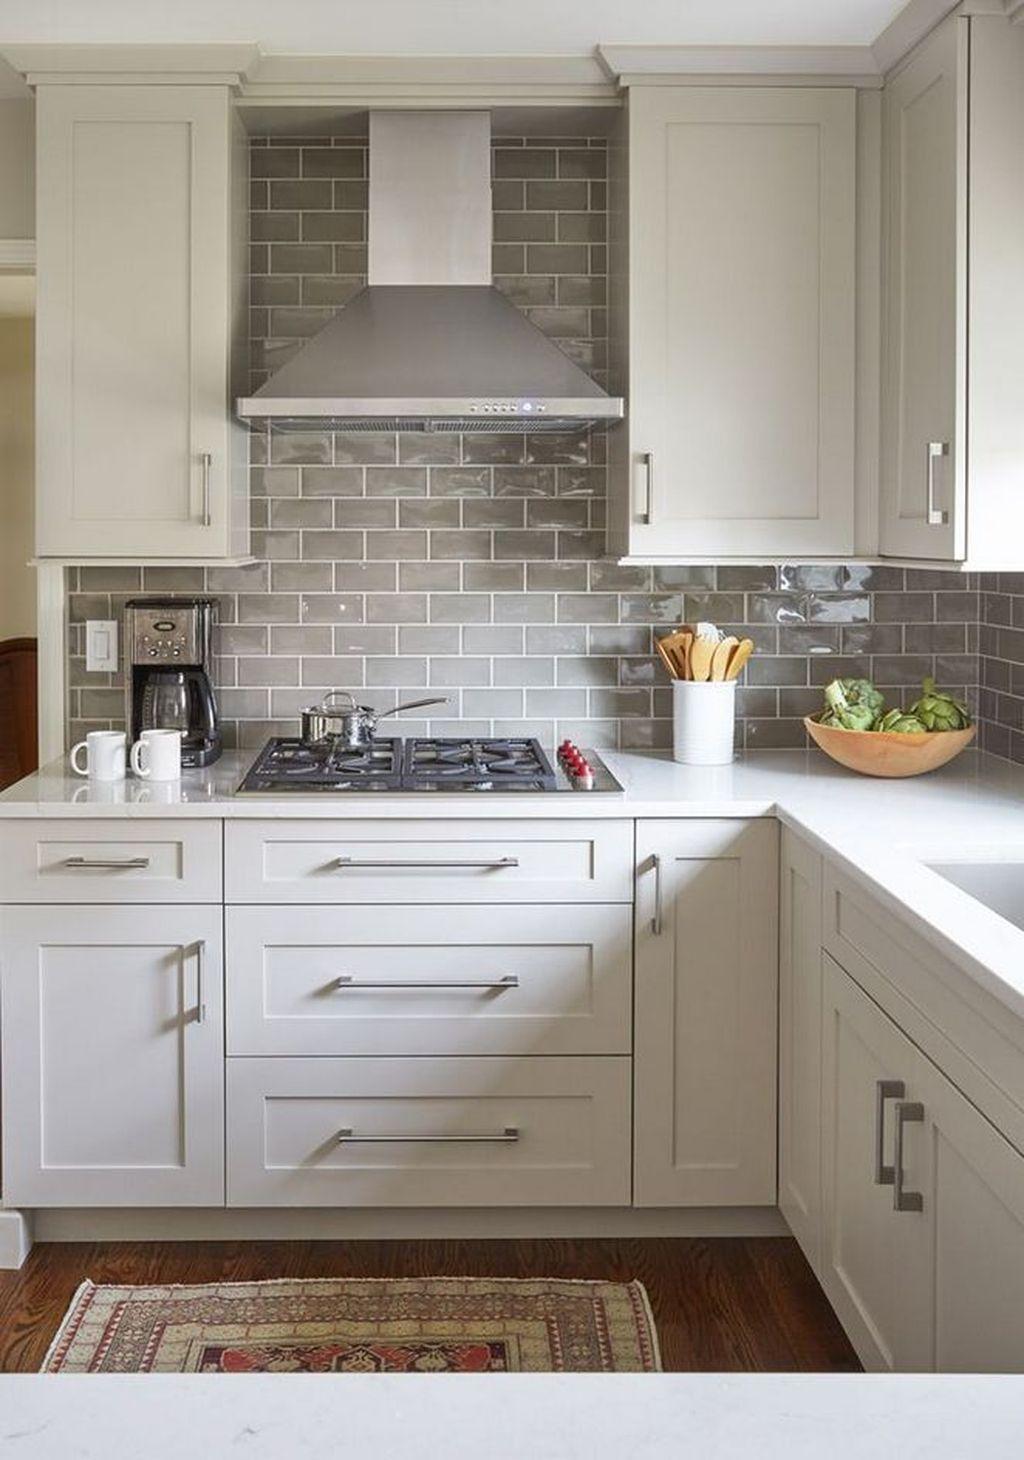 36 Stunning Kitchen Cabinets Ideas Kitchen Backsplash Designs New Kitchen Cabinets Diy Kitchen Backsplash